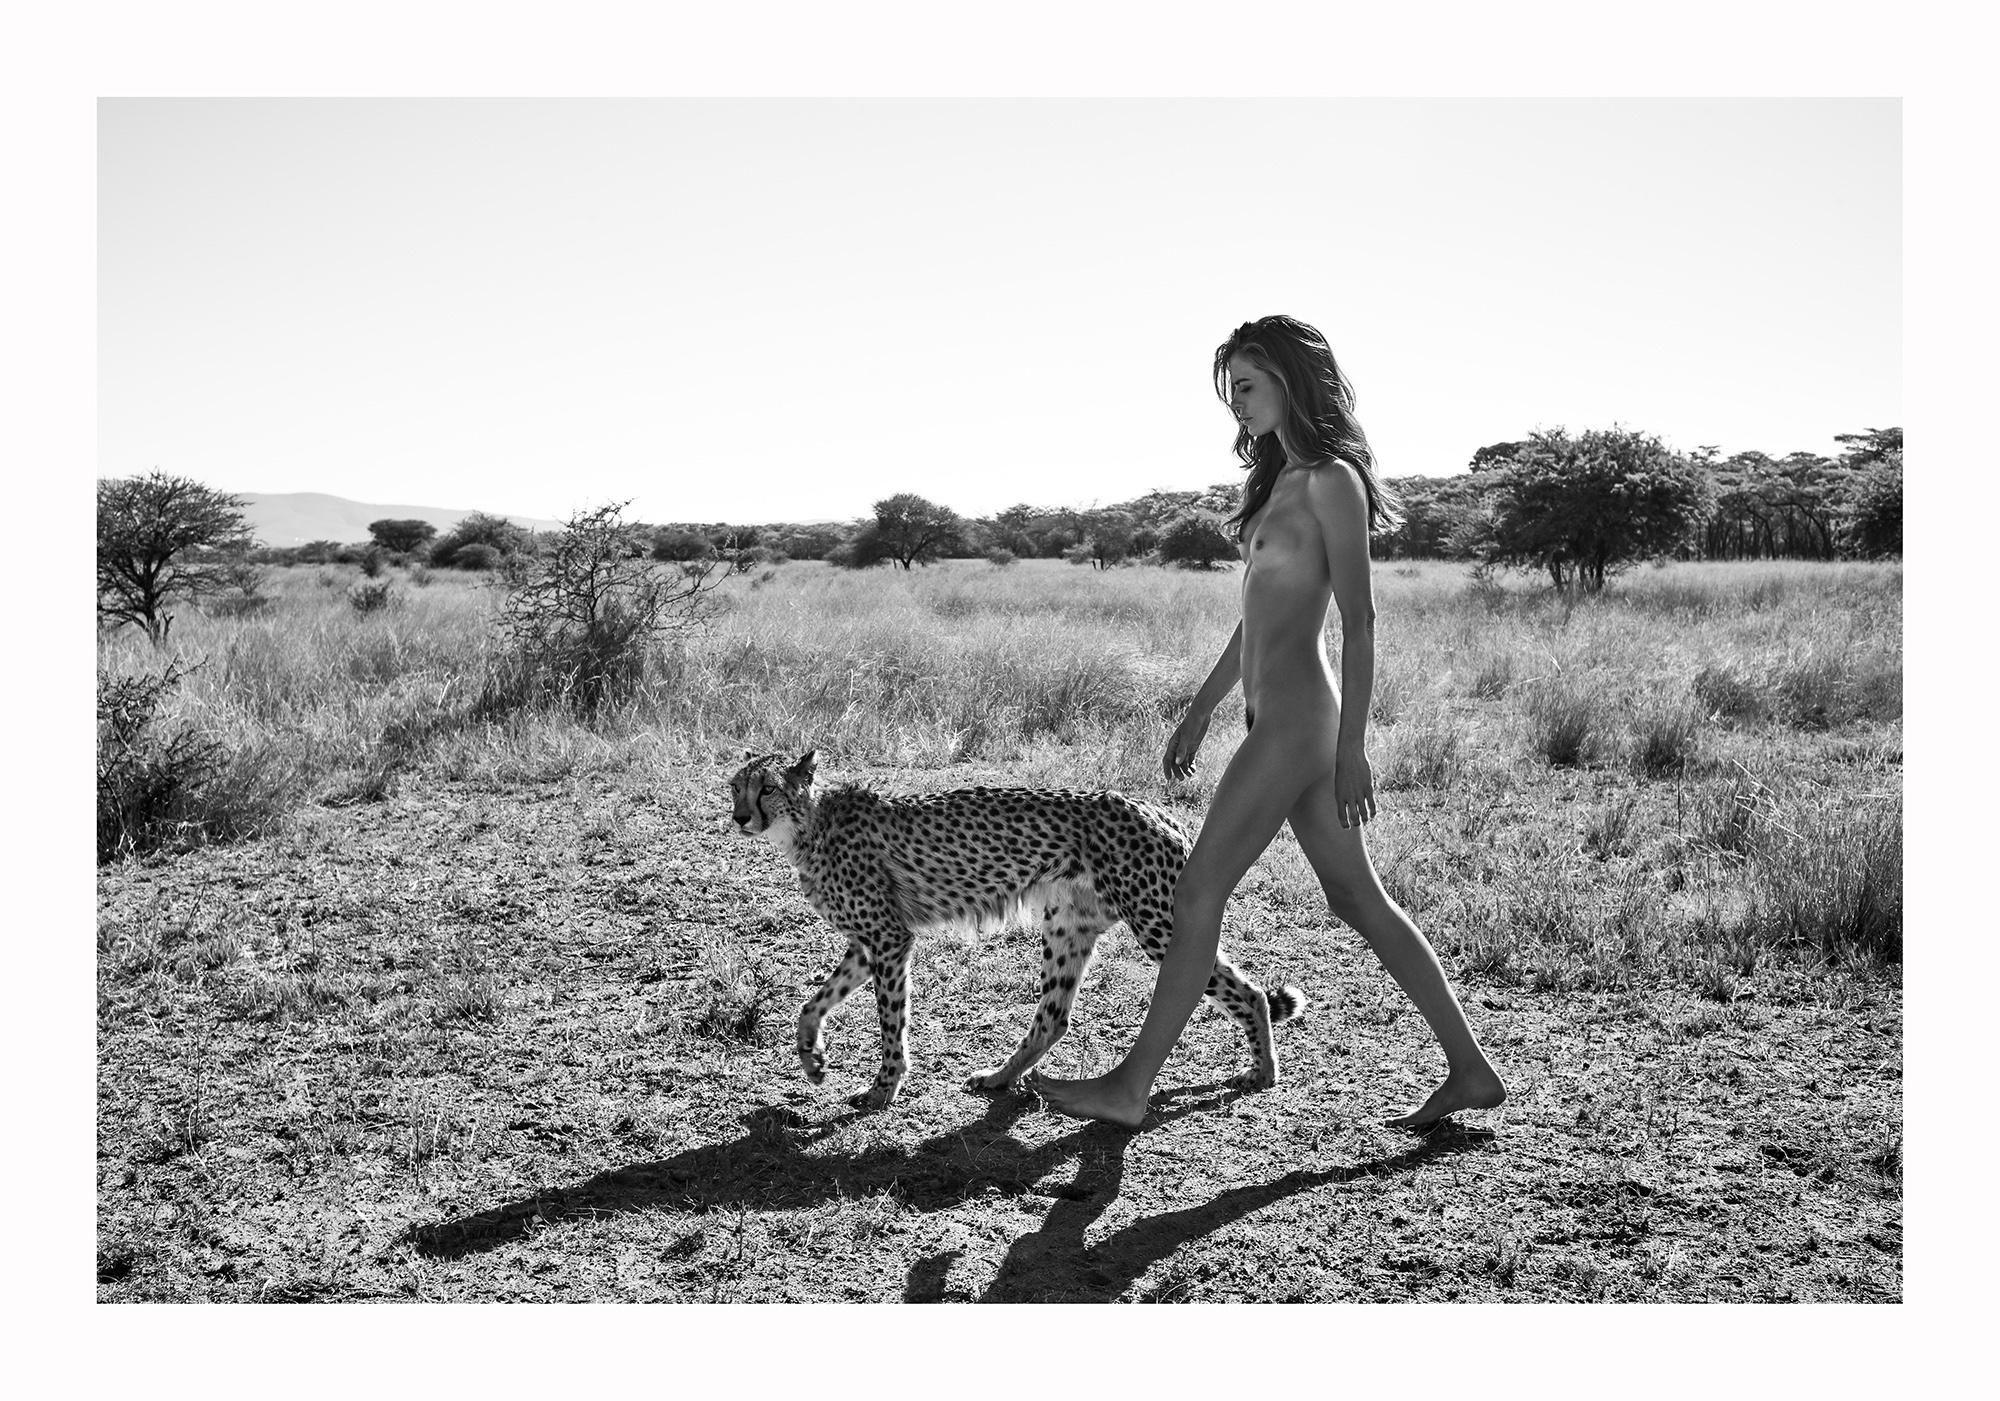 12 Natural Wonders in Afrika von Paul Giggle 11